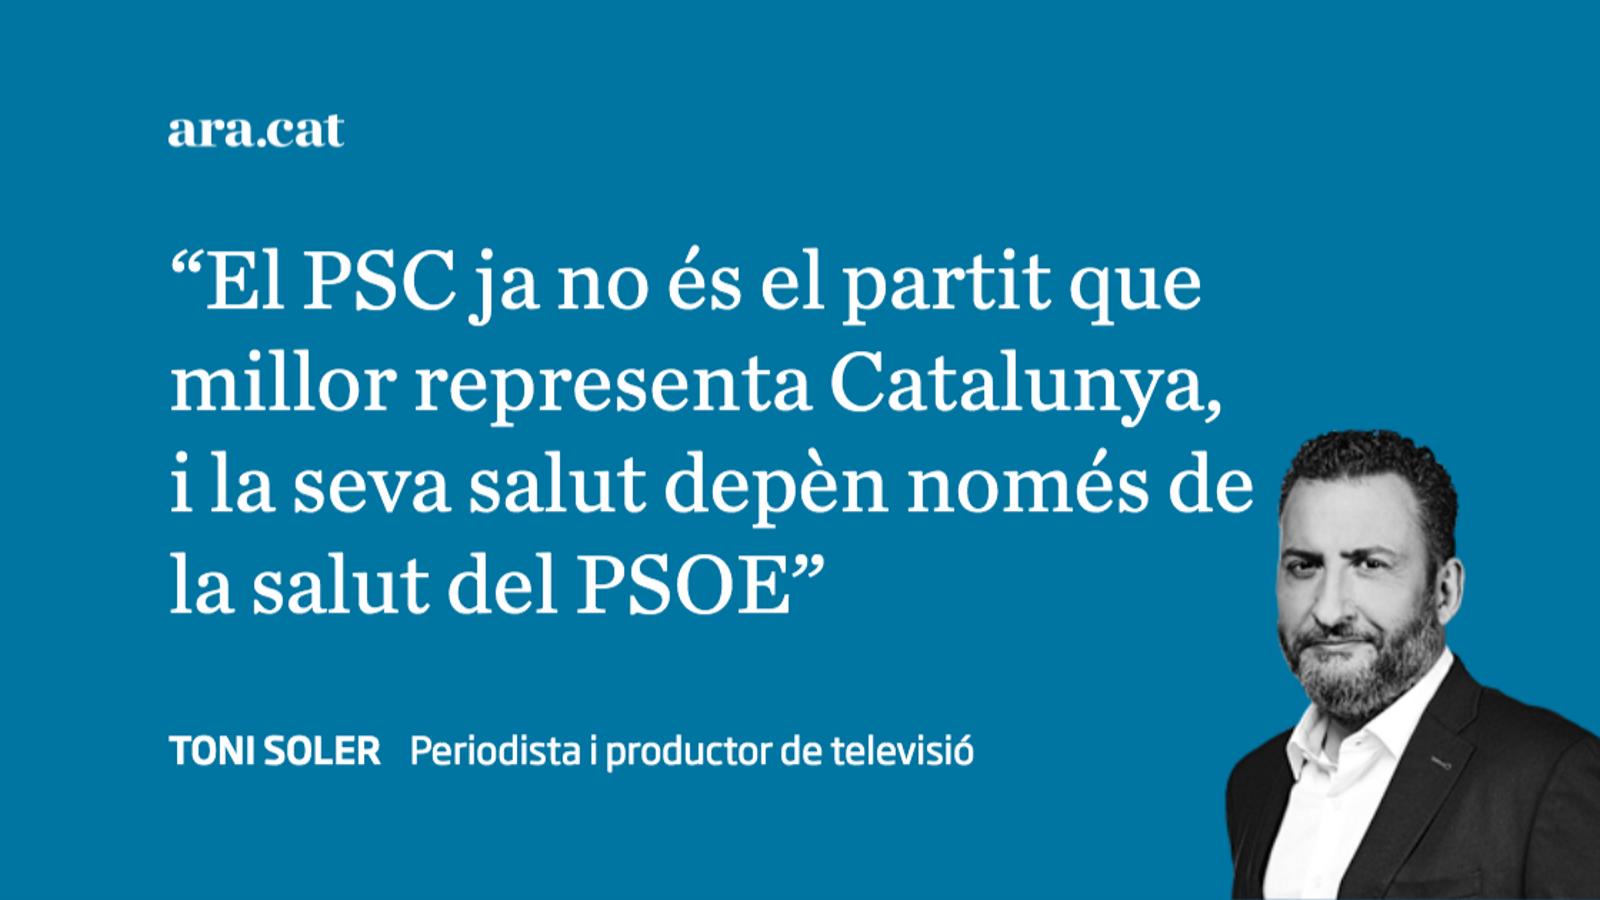 El PSC,  'in memoriam'